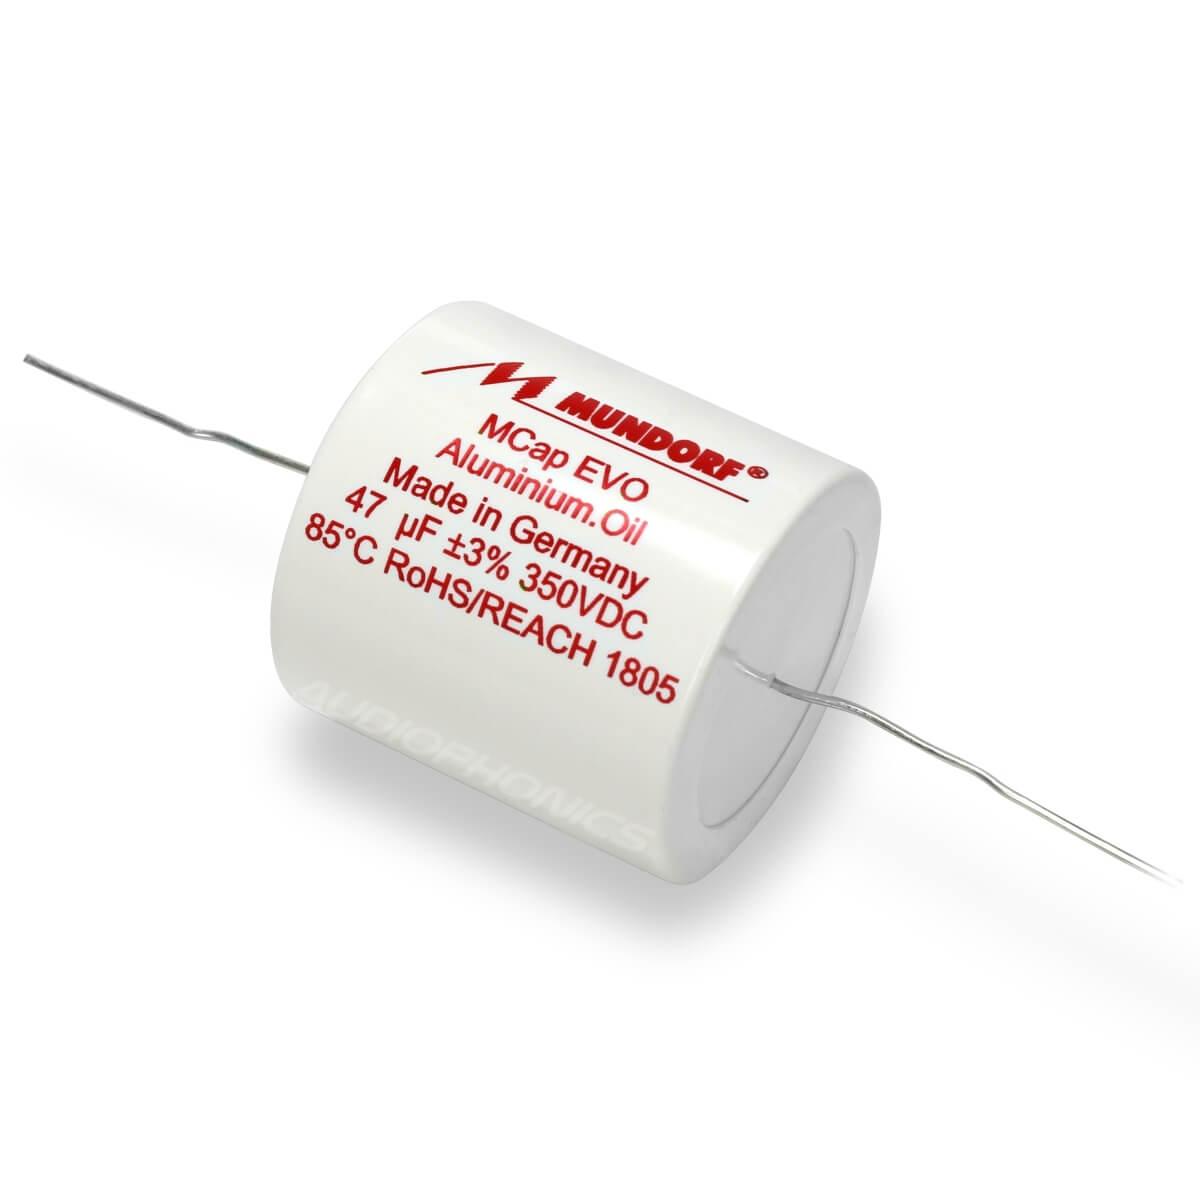 MUNDORF MCAP EVO OIL Condensateur 350V 39µF